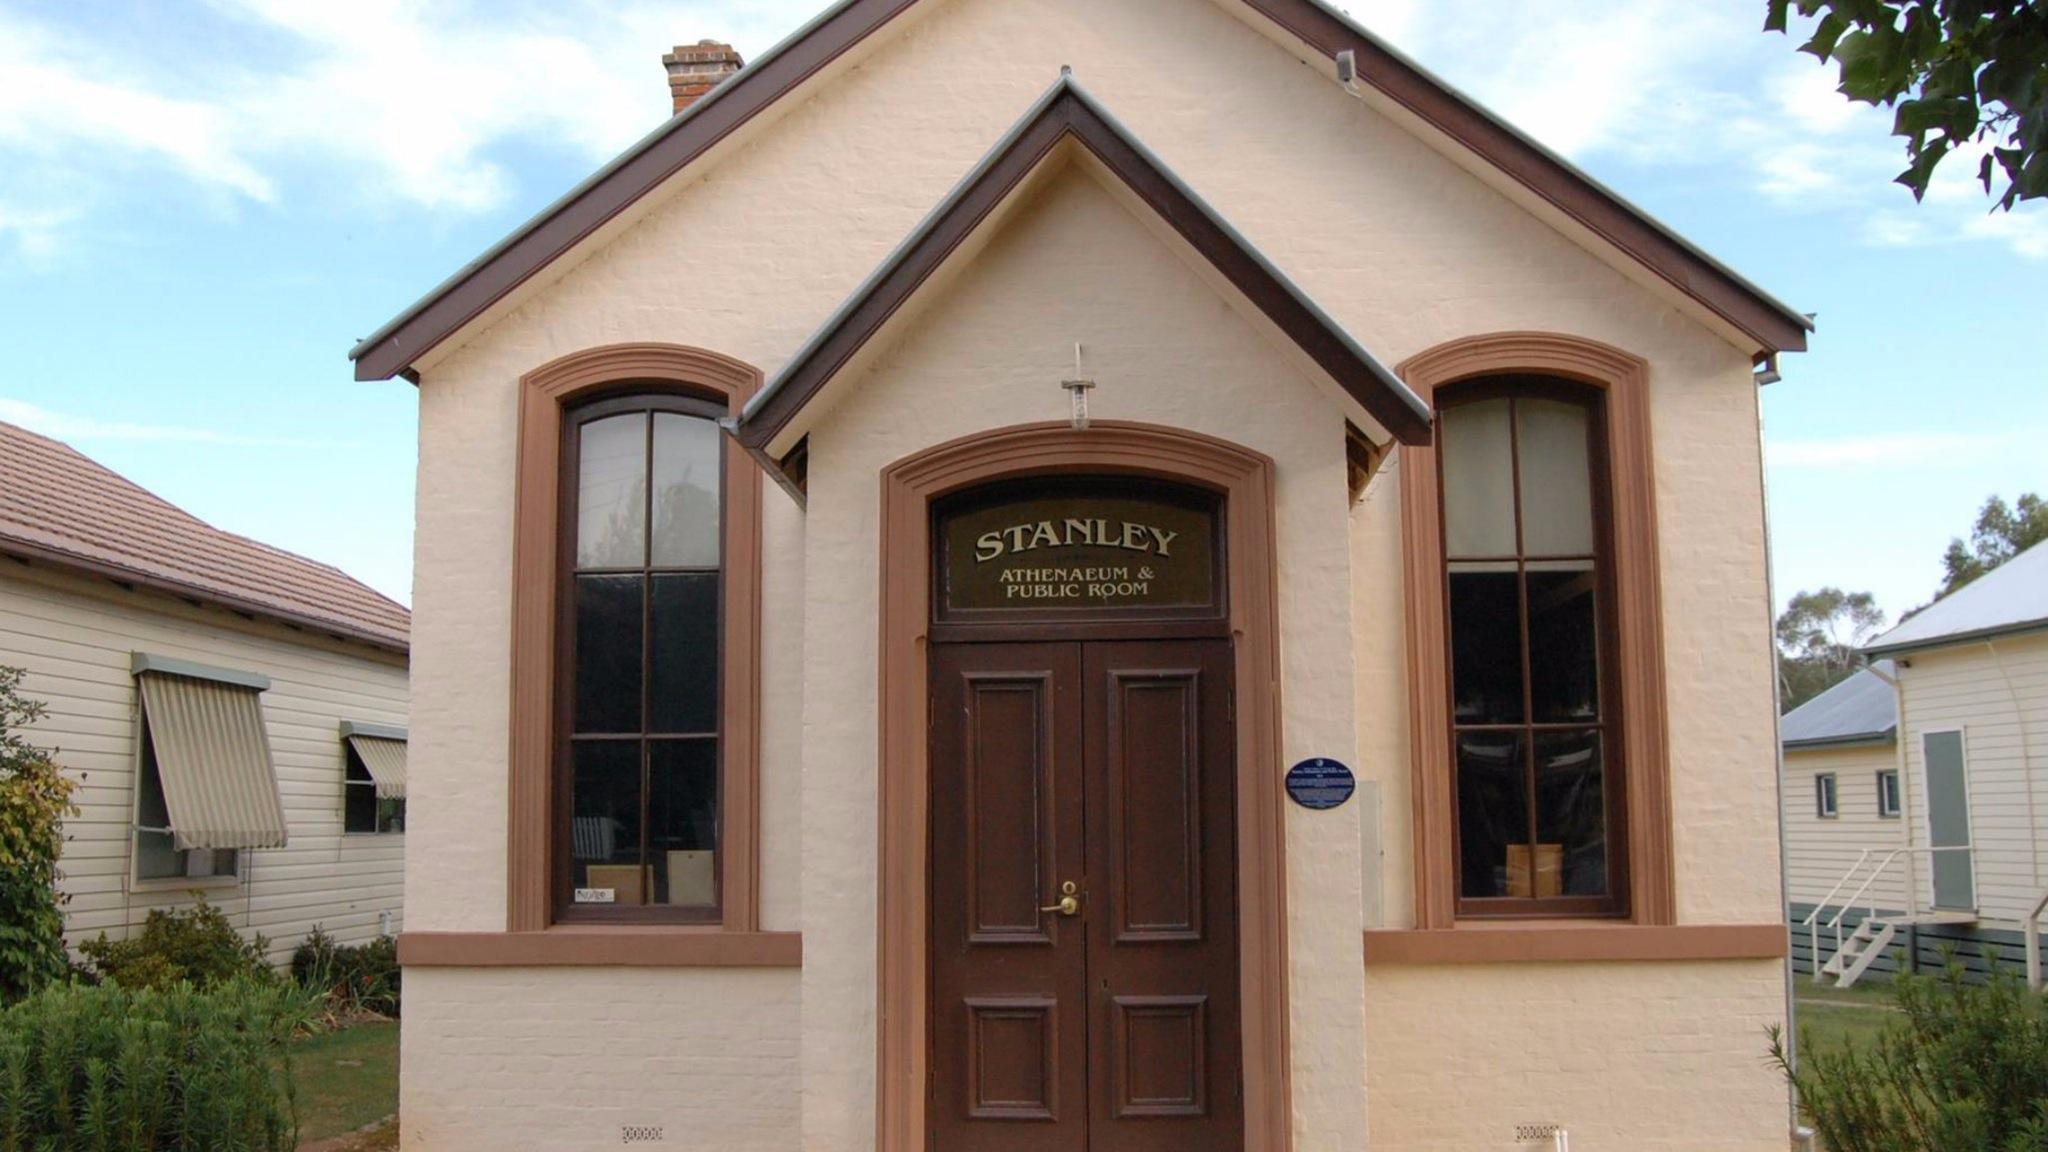 Stanley Athenaeum